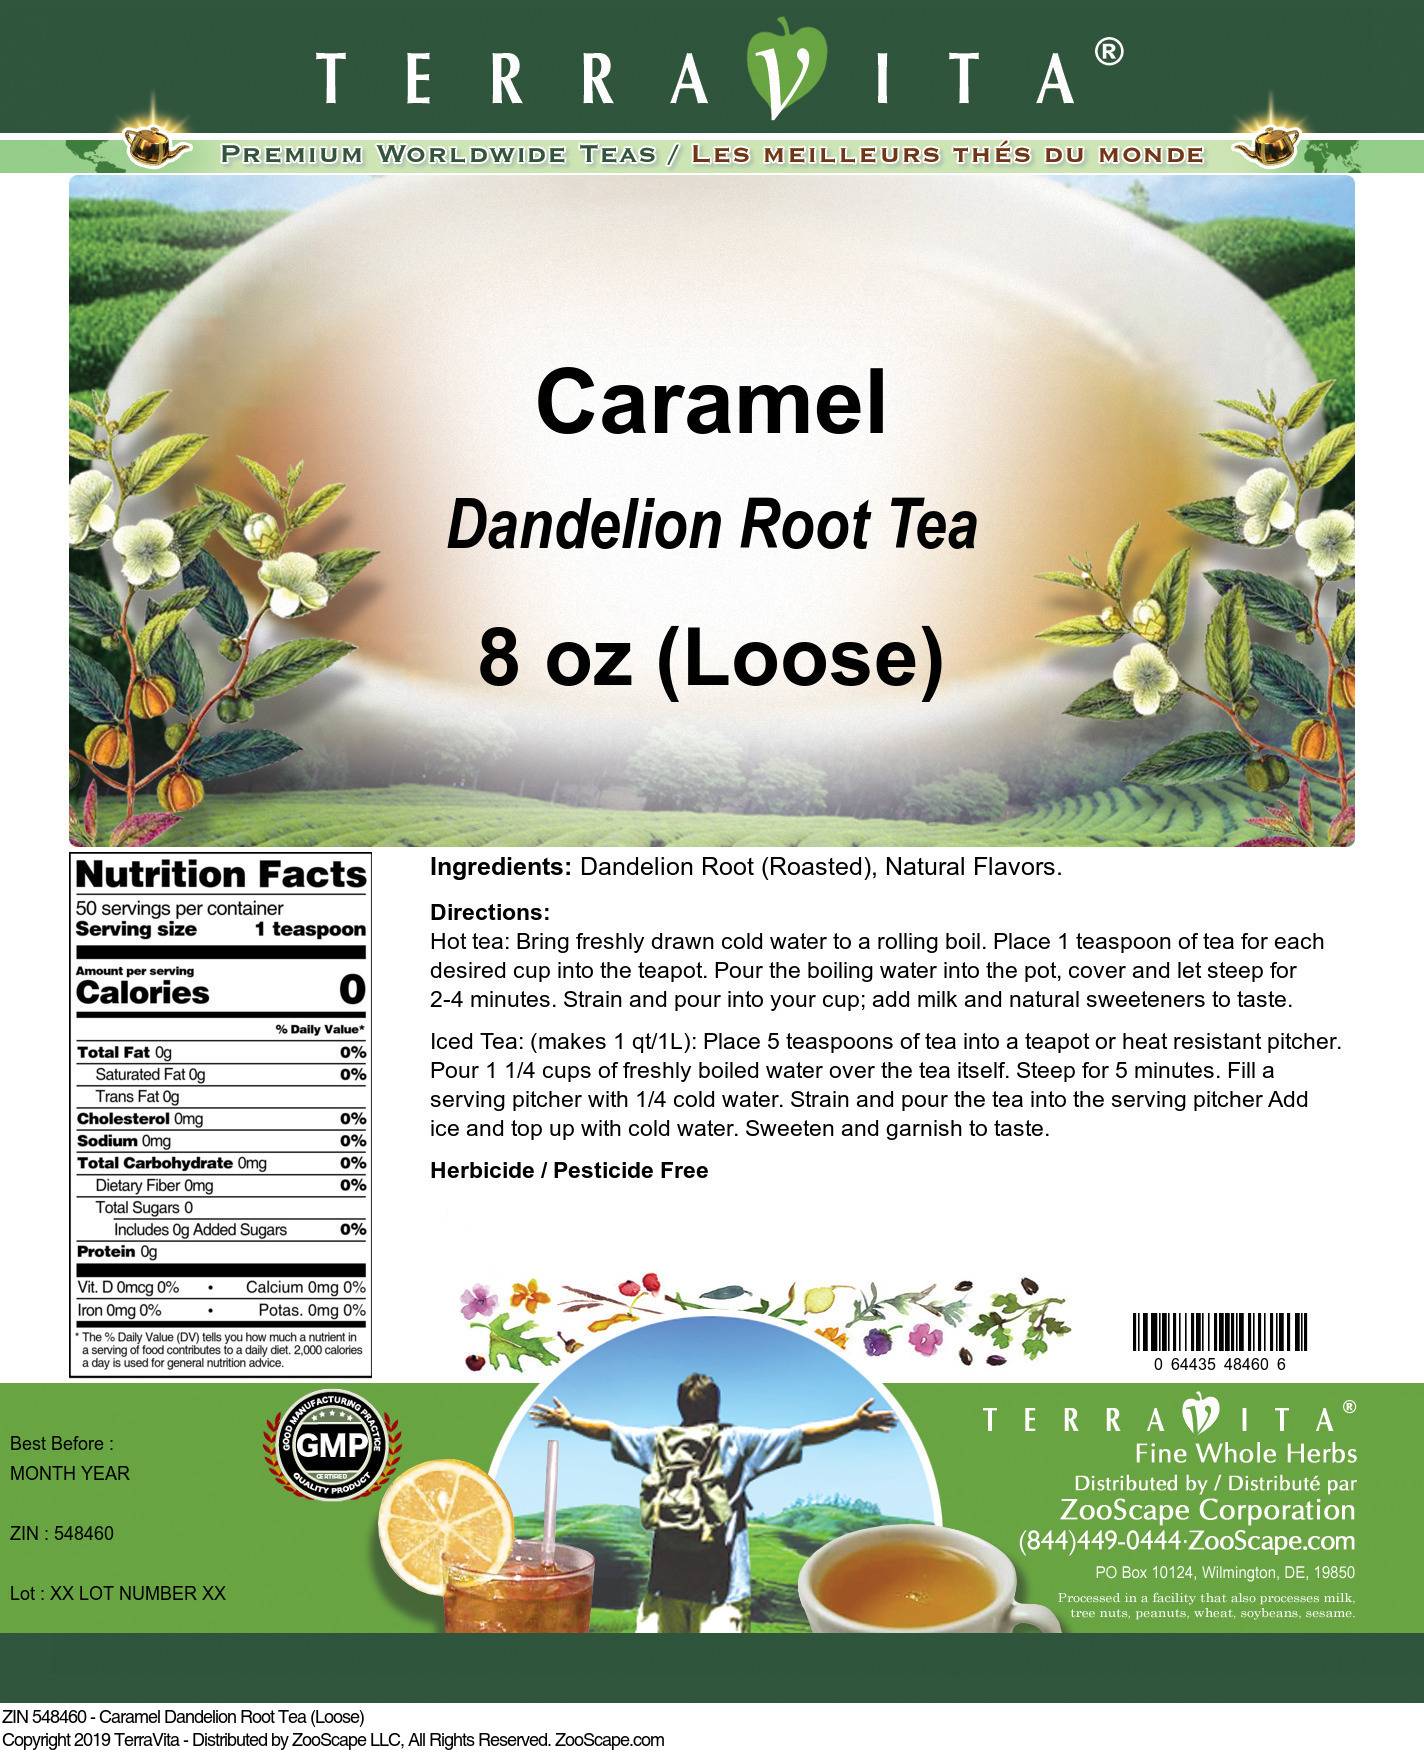 Caramel Dandelion Root Tea (Loose)